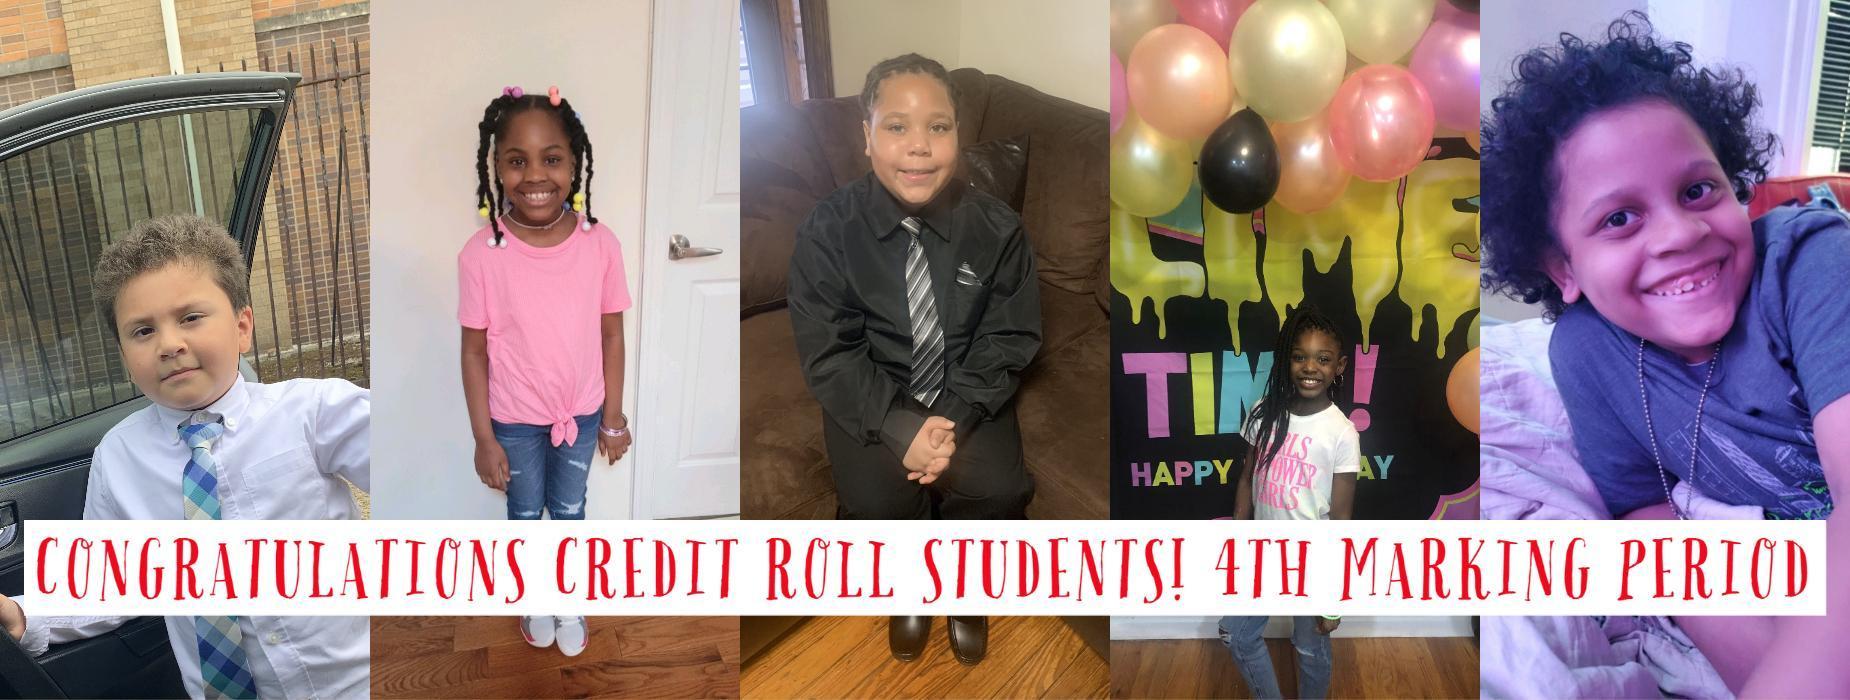 Credit roll